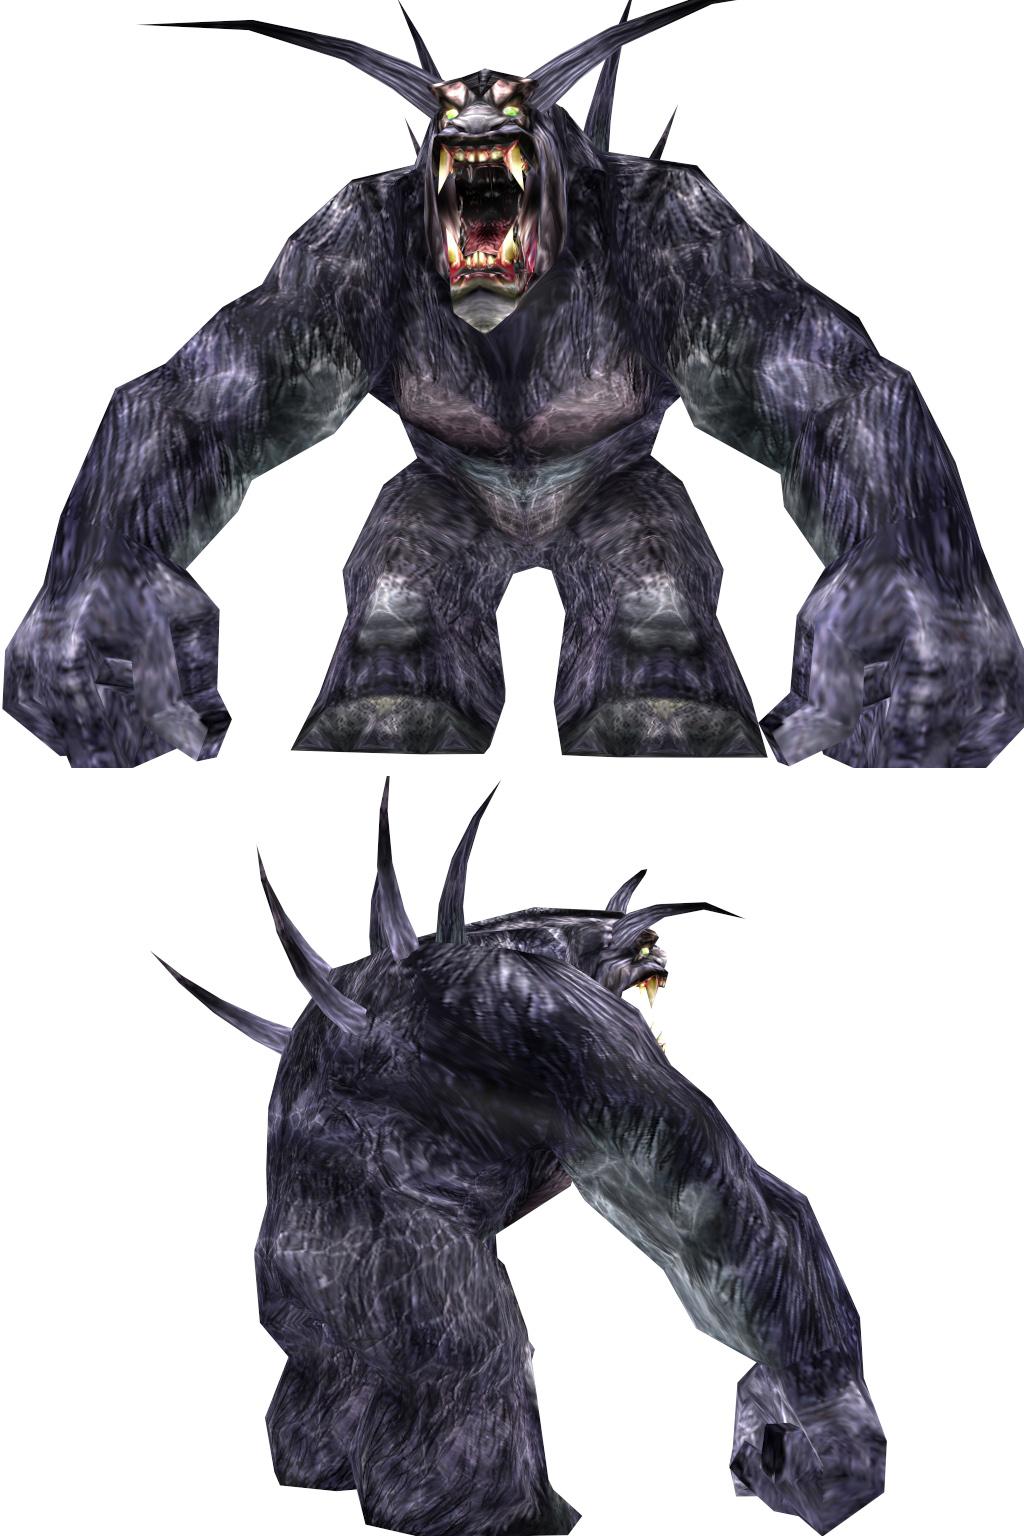 Demonic Troll